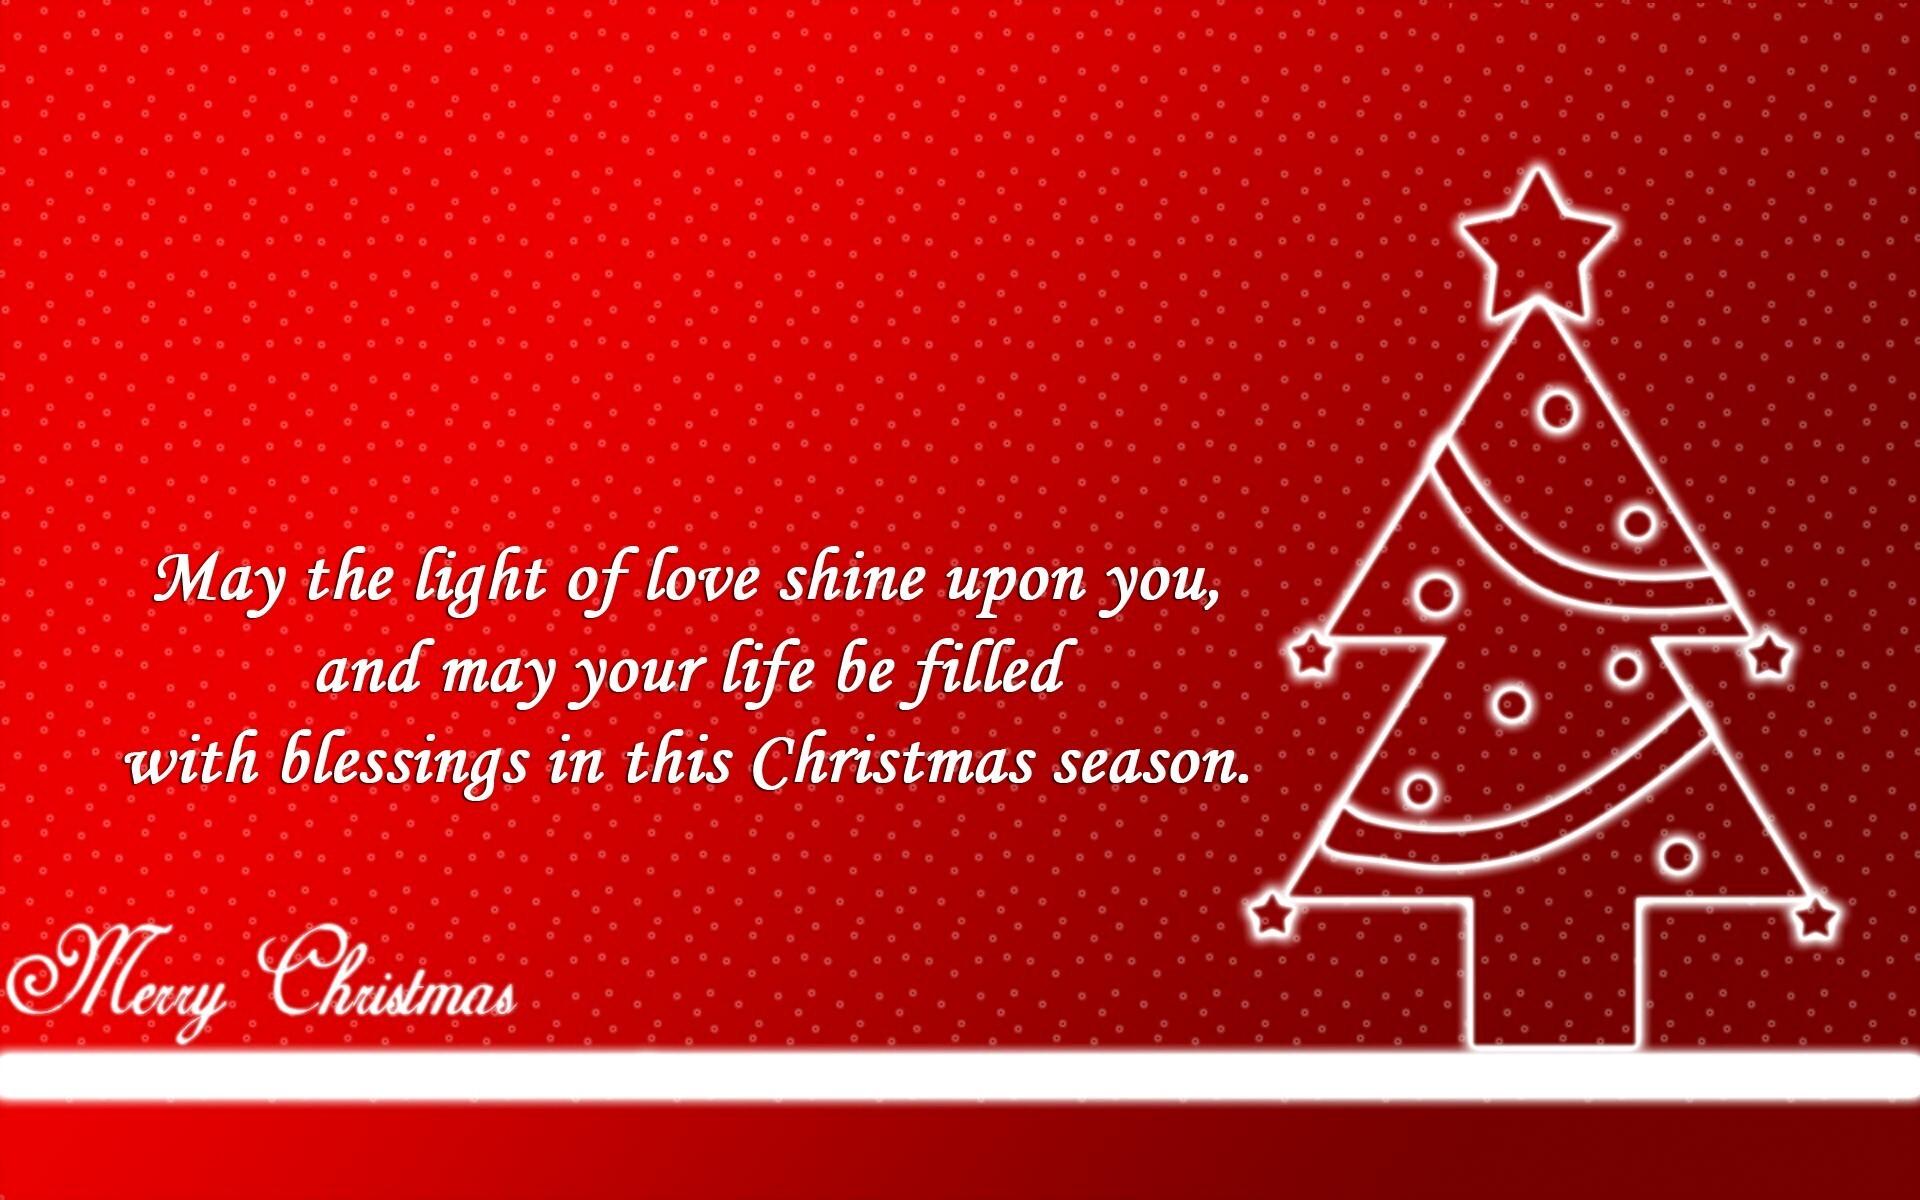 Beautiful Christmas Greeting Quote Hd Desktop Wallpapers Hd Wallpapers